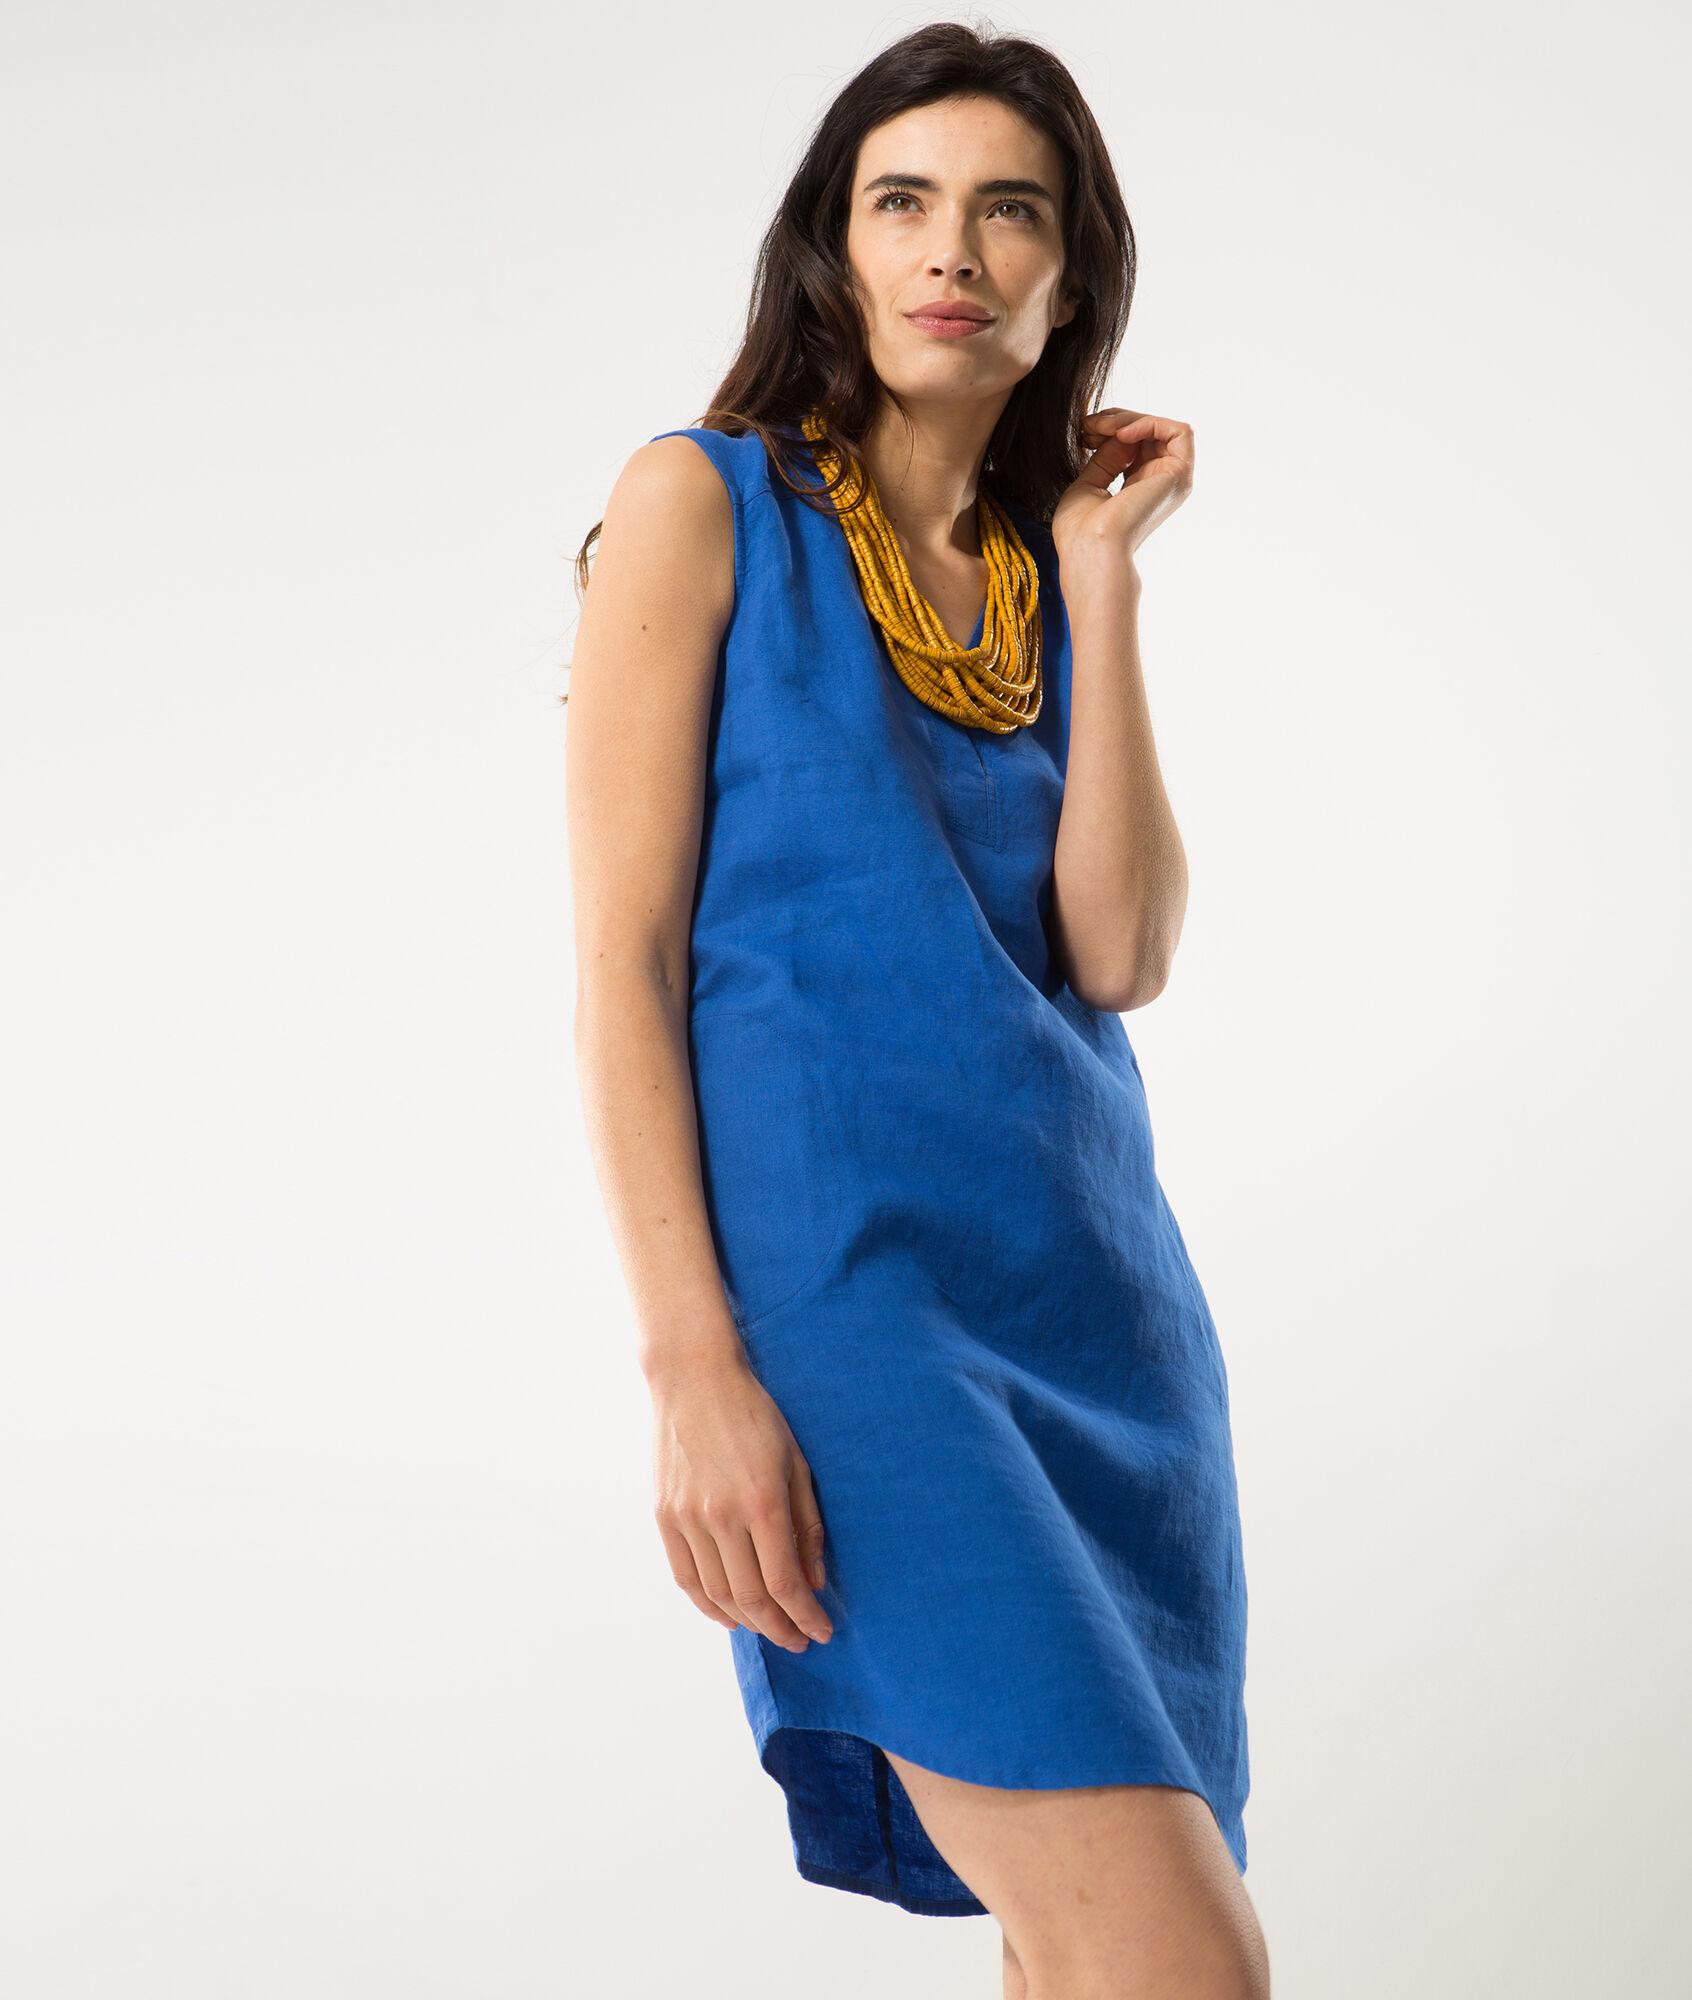 Comment porter une robe bleu roi